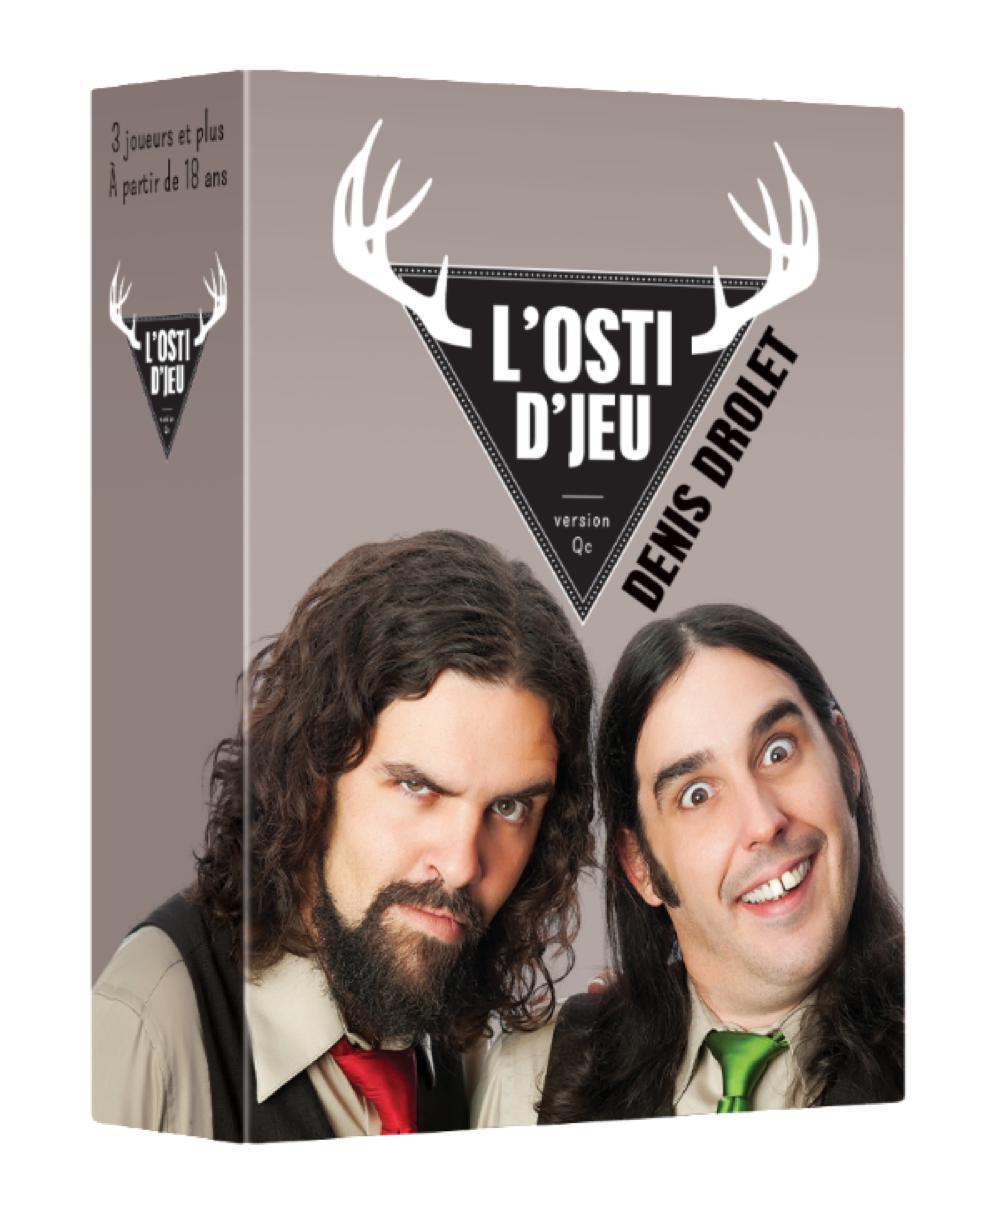 Jeu L'Osti d'jeu - Extension Denis Drolet